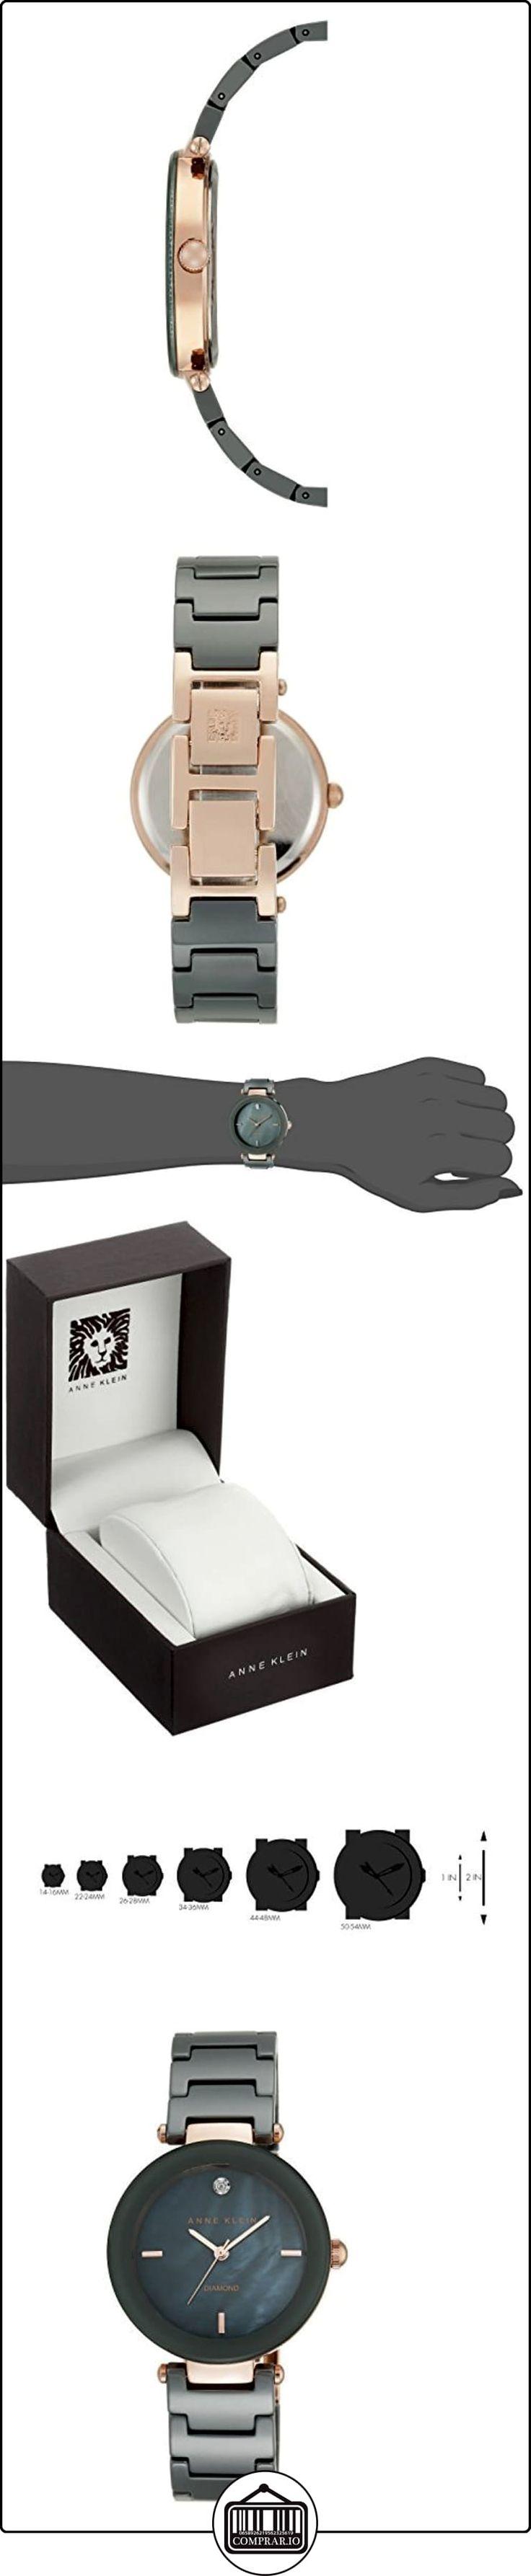 Anne Klein - Reloj de pulsera  ✿ Relojes para mujer - (Gama media/alta) ✿